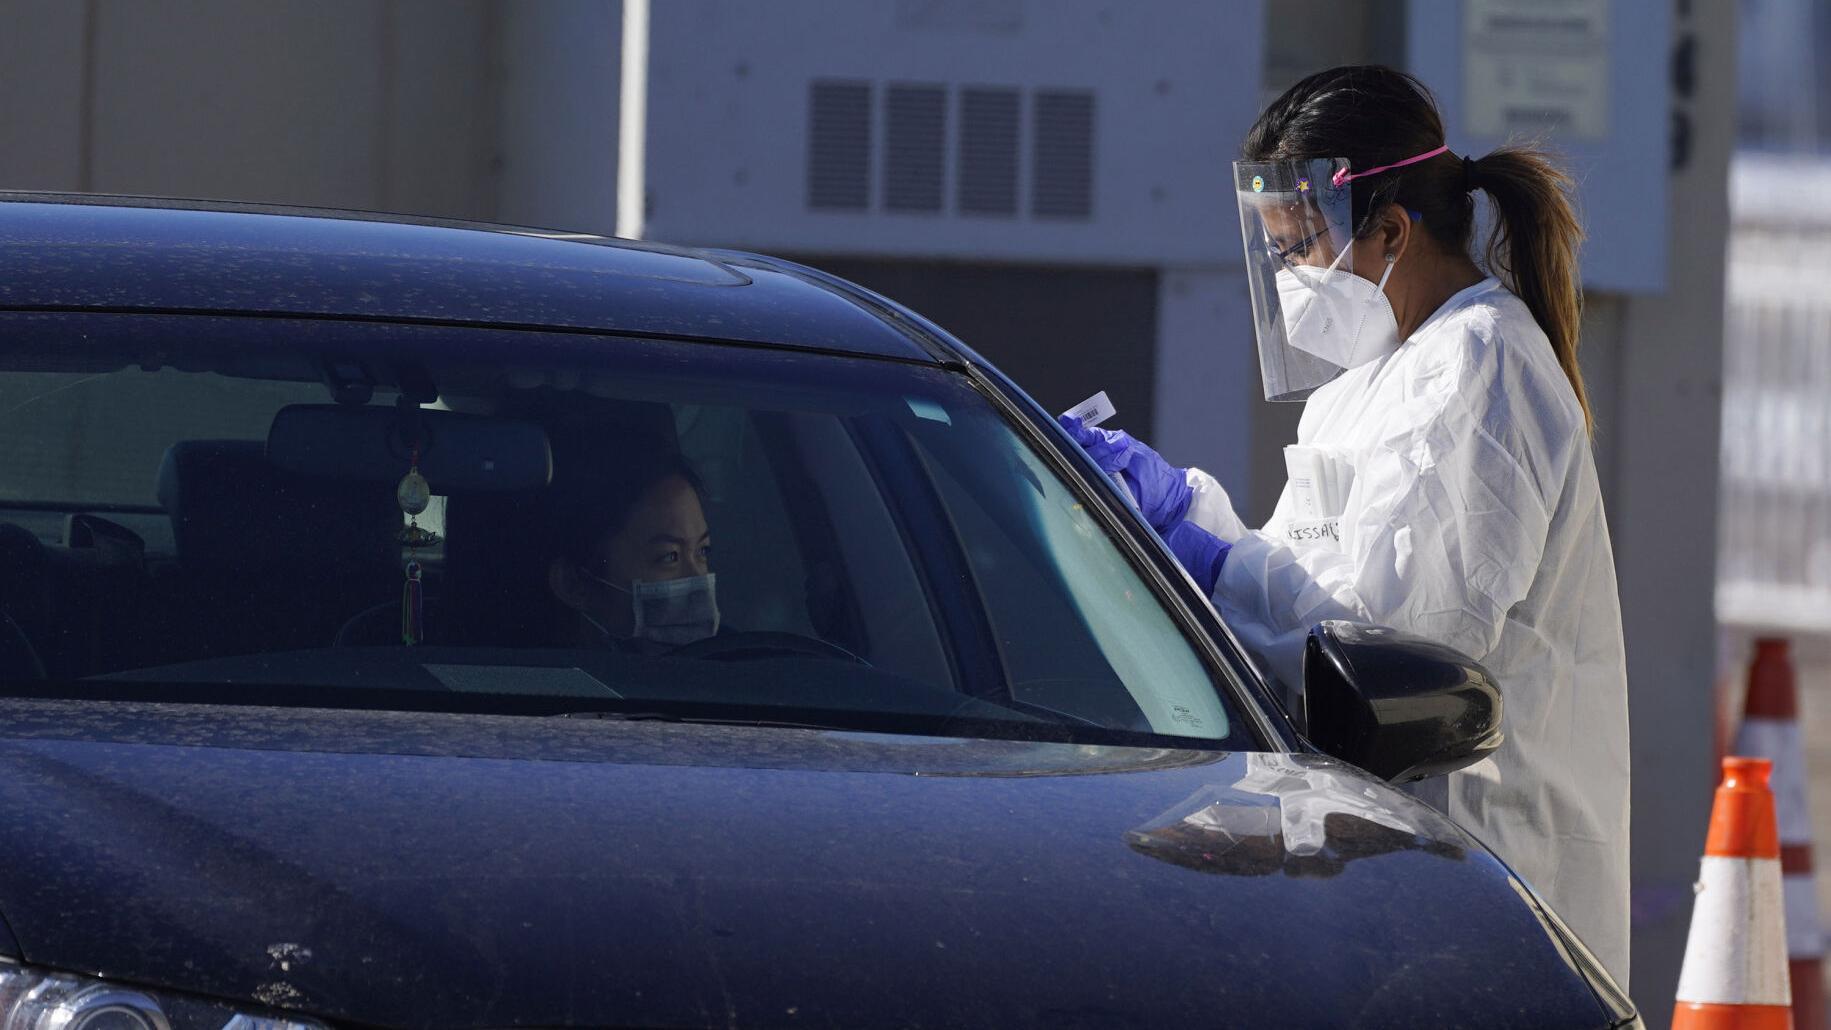 Free Covid 19 Testing Sites To Open This Weekend In Denver Coronavirus Coloradopolitics Com